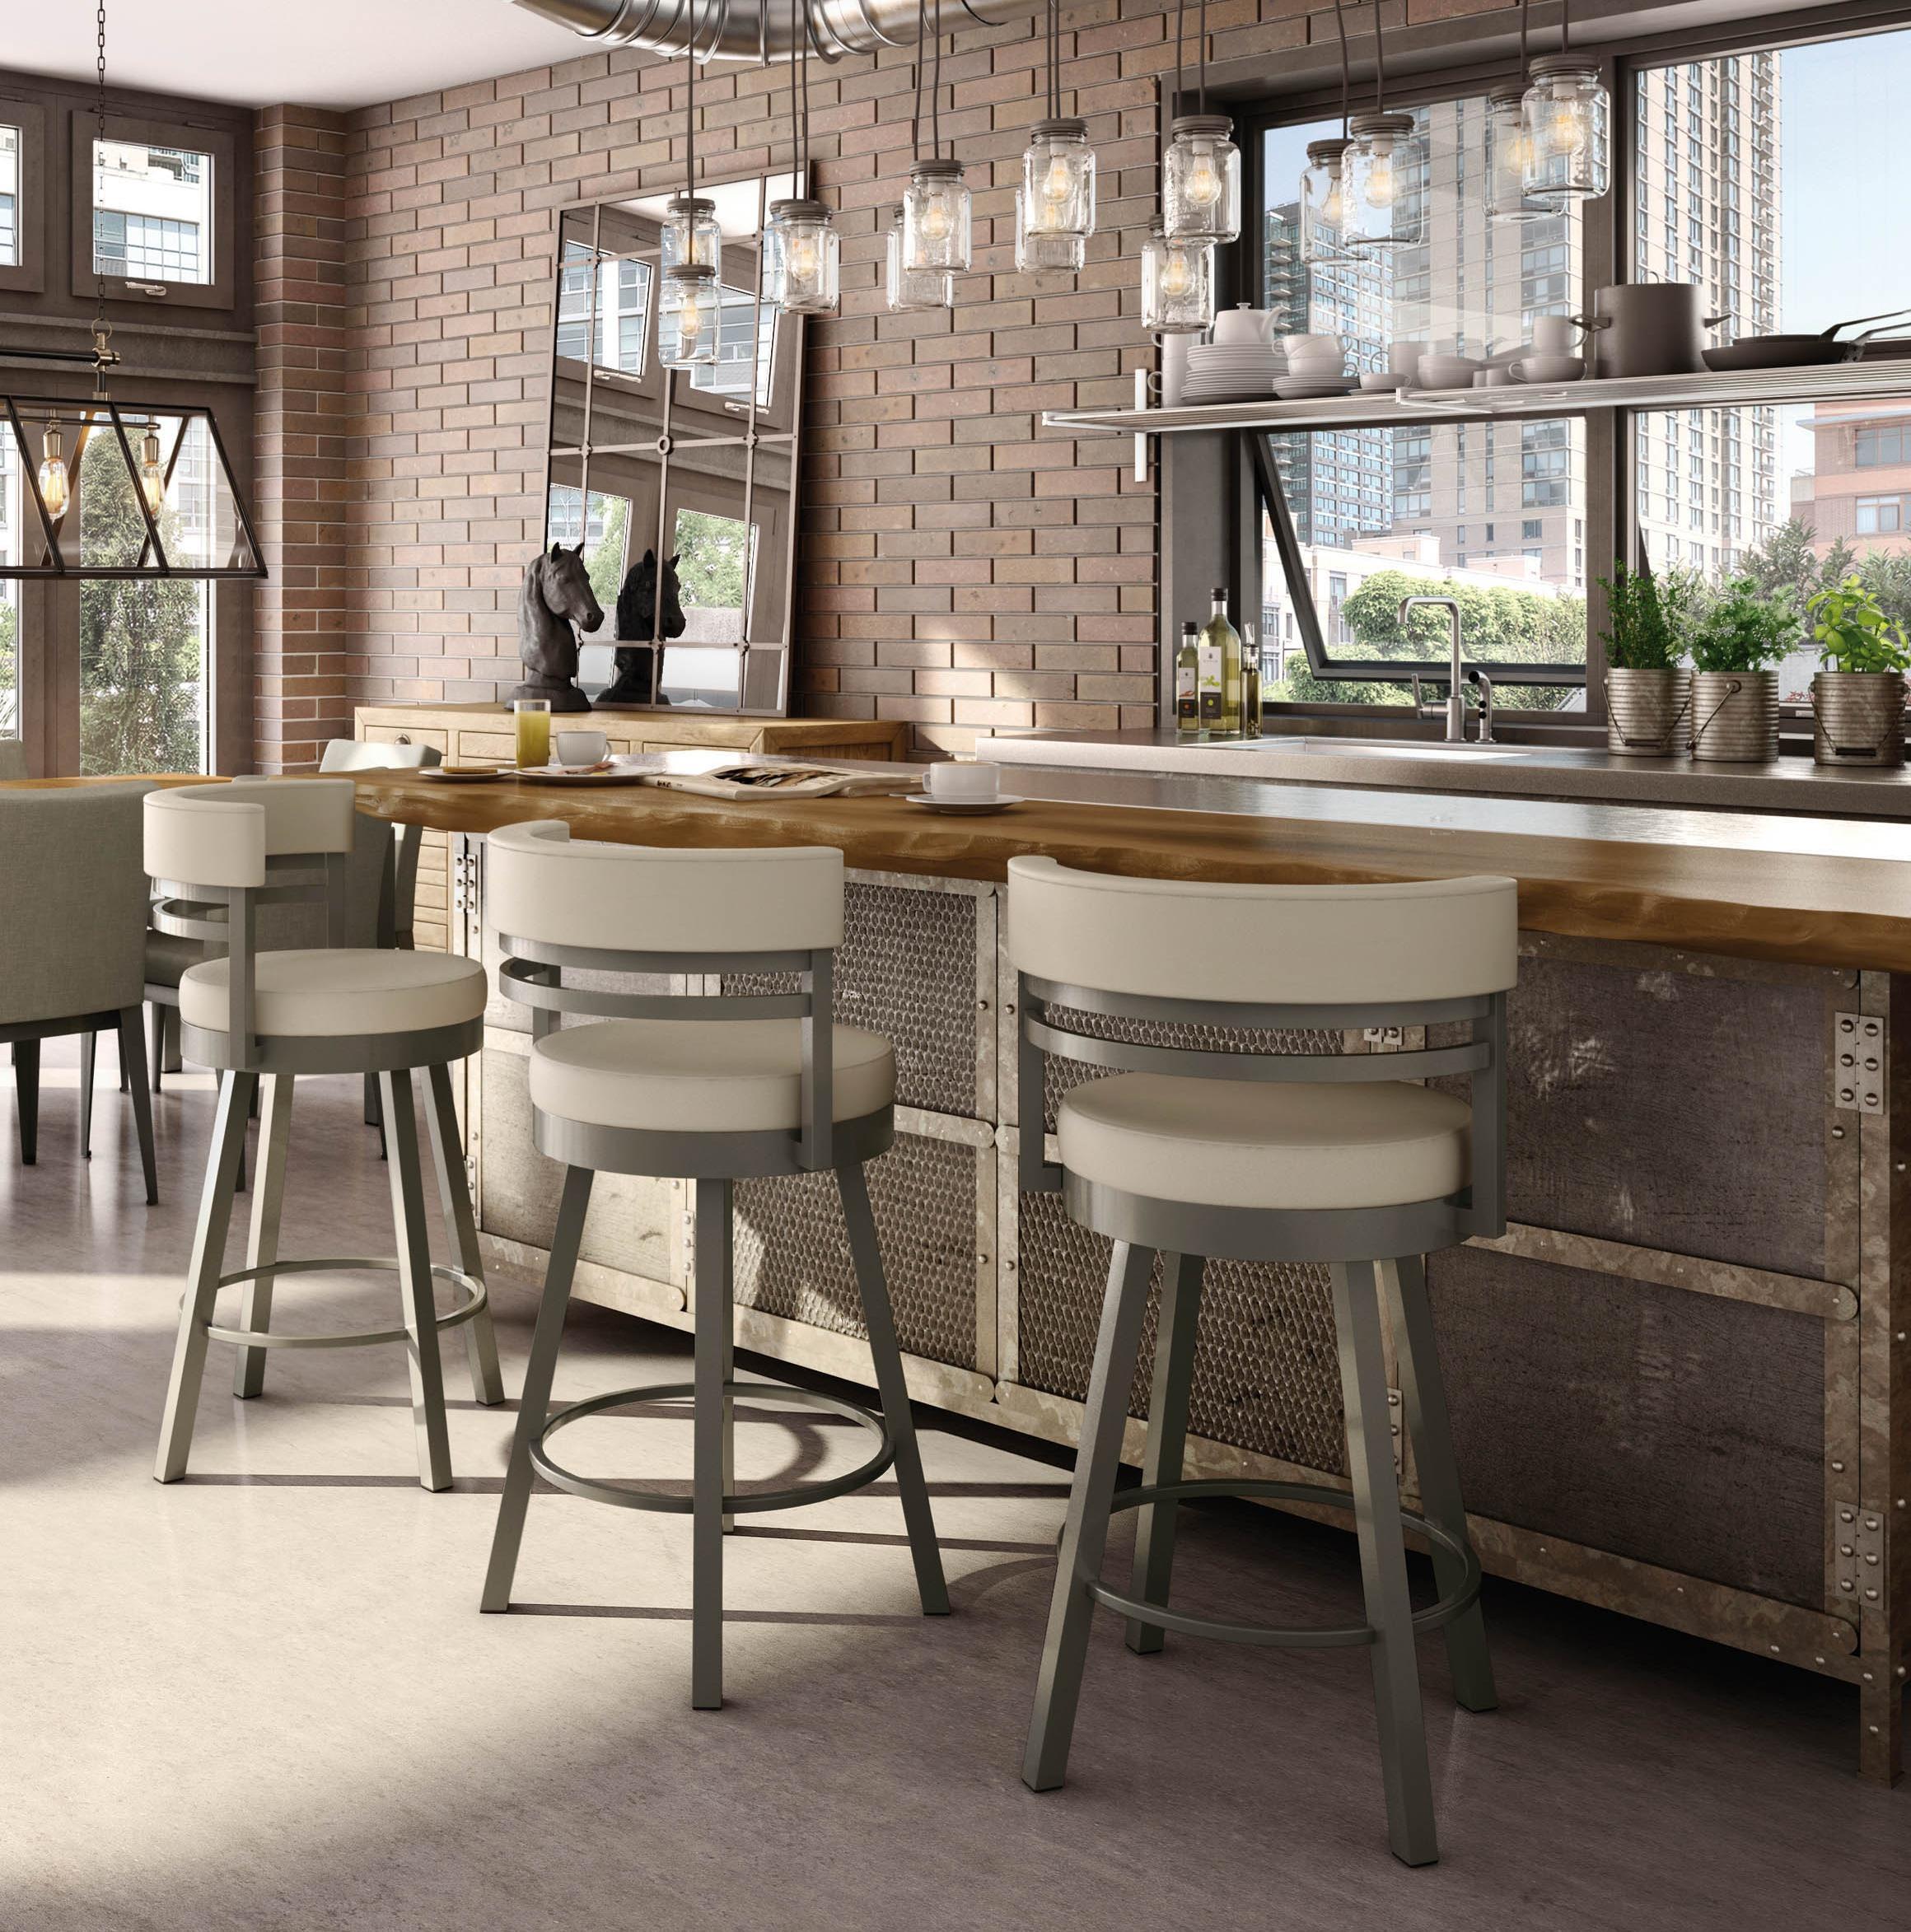 Furniture Stores Deptford Nj Sectional Sofas Outdoor